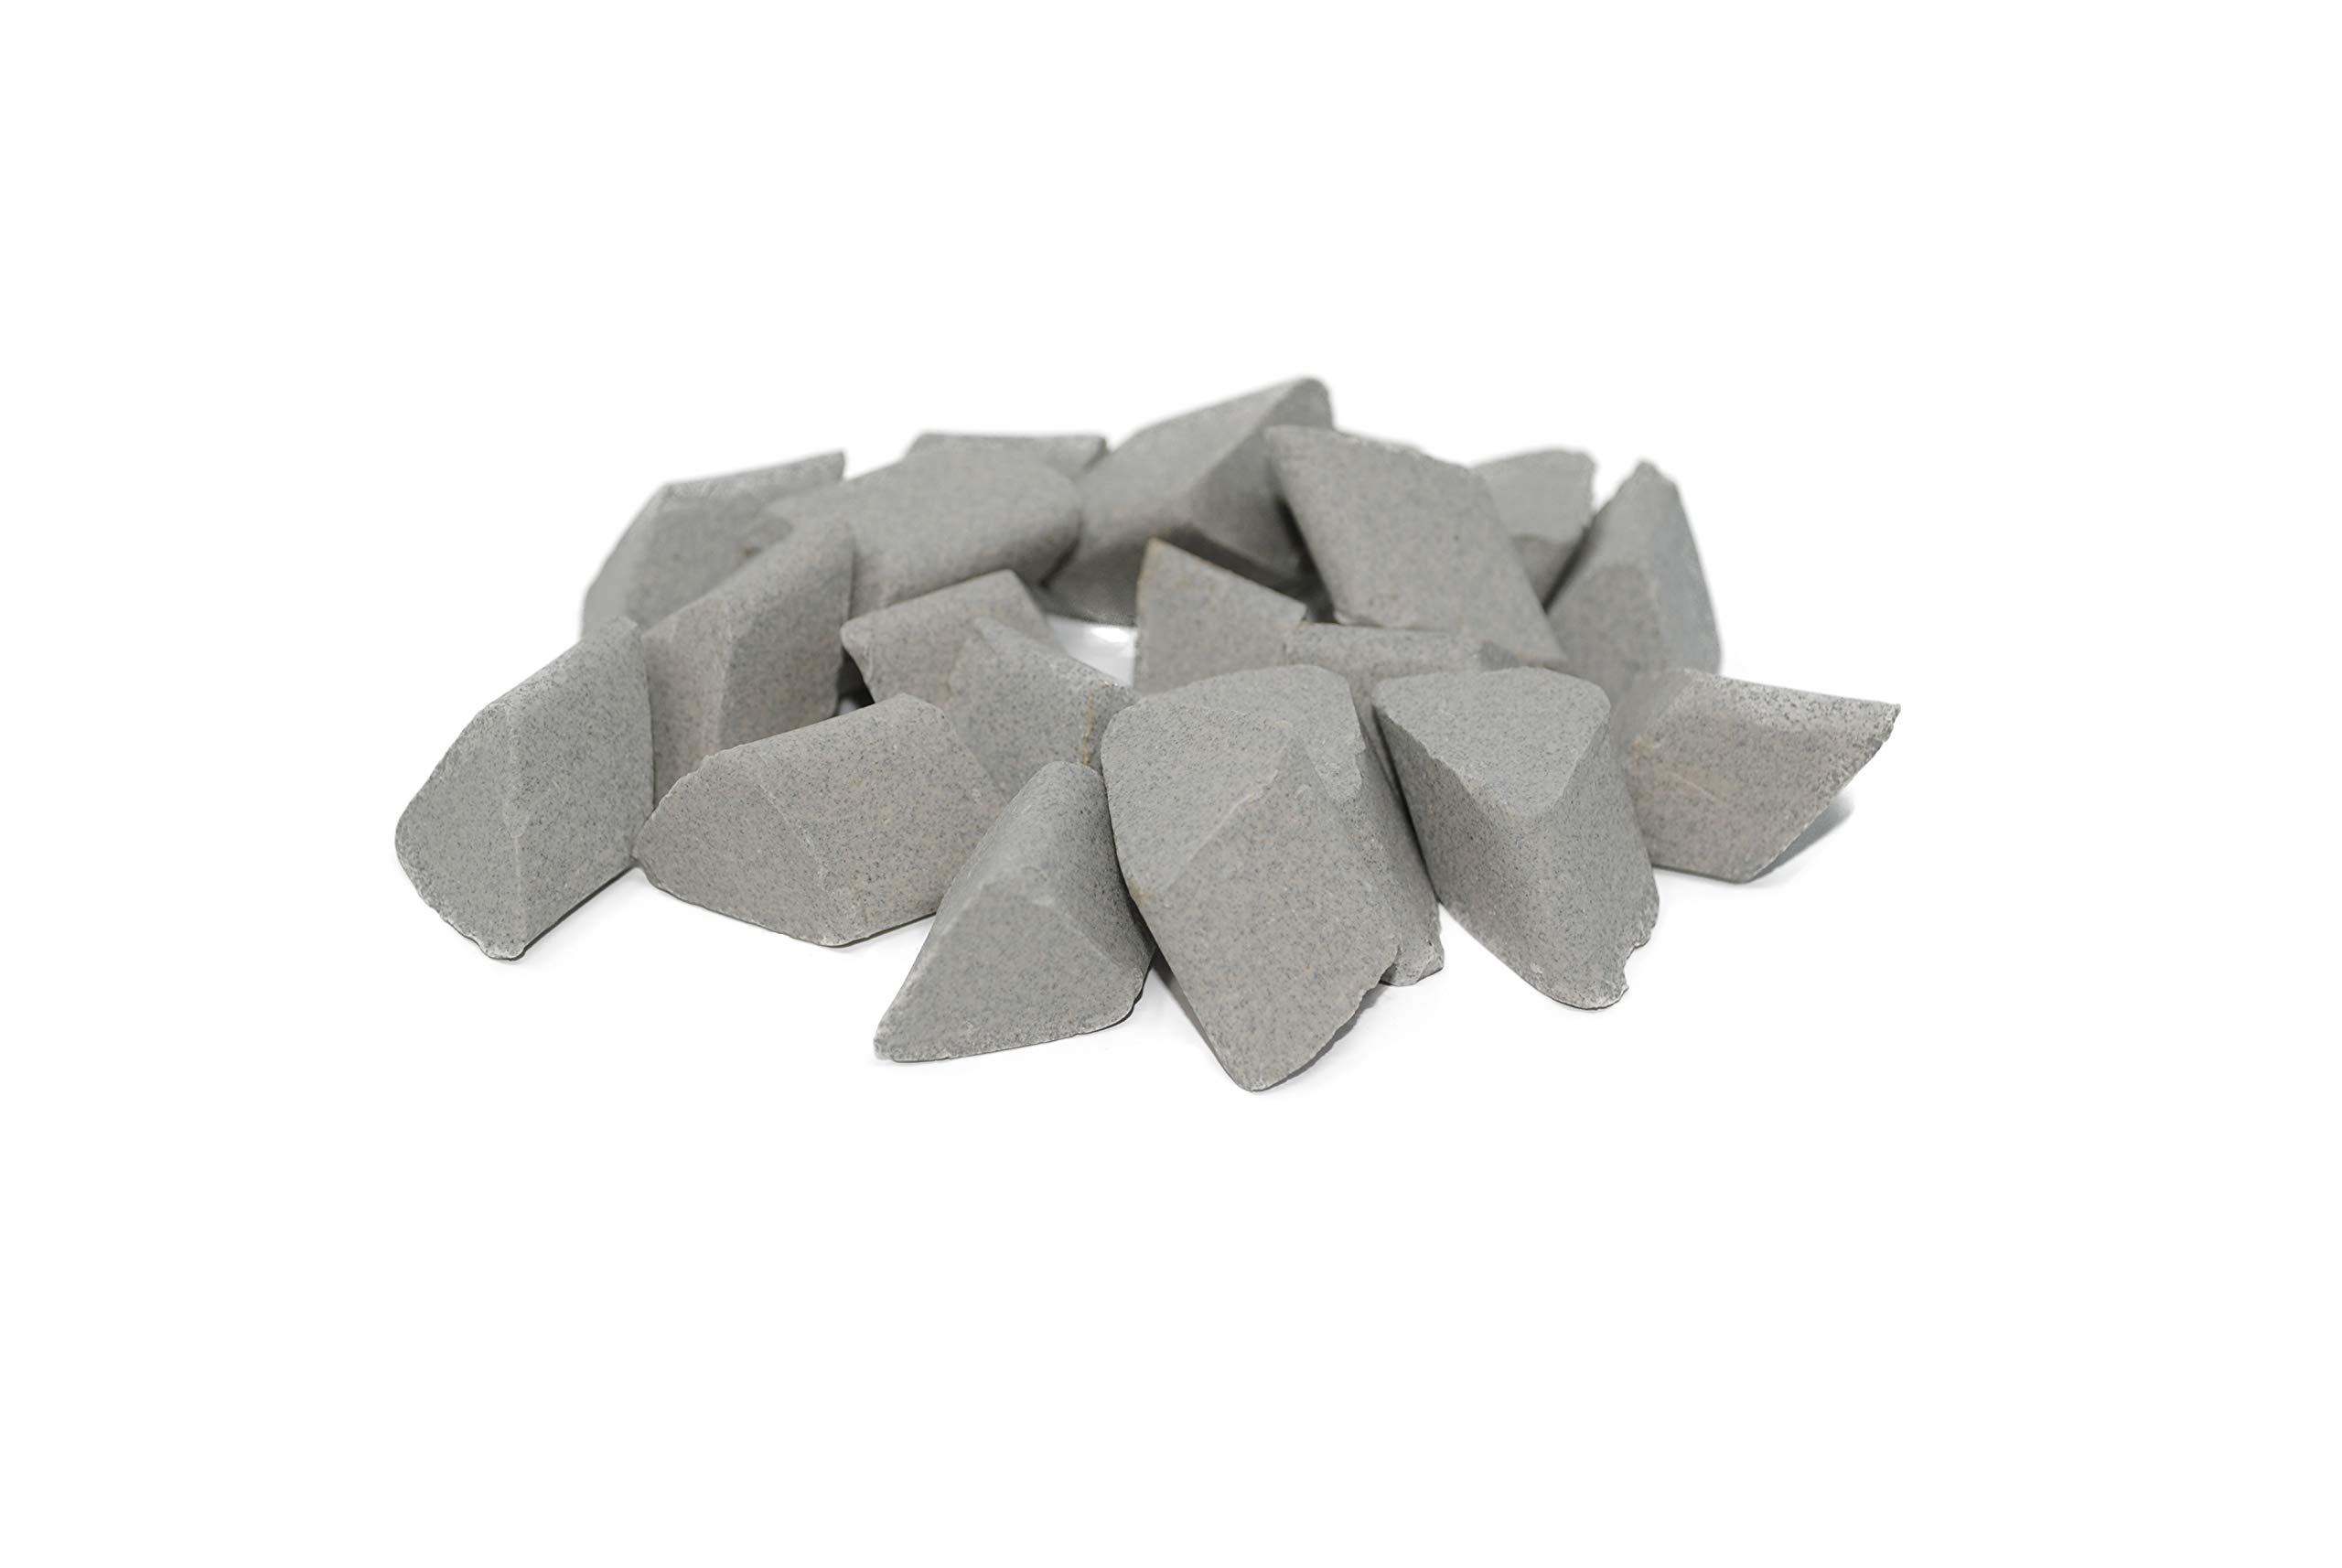 Walther Trowal F 15X15 Angle Cut, Triangle Shape, Ceramic Tumbling Rocks, 55 lb Bag, Medium Cut